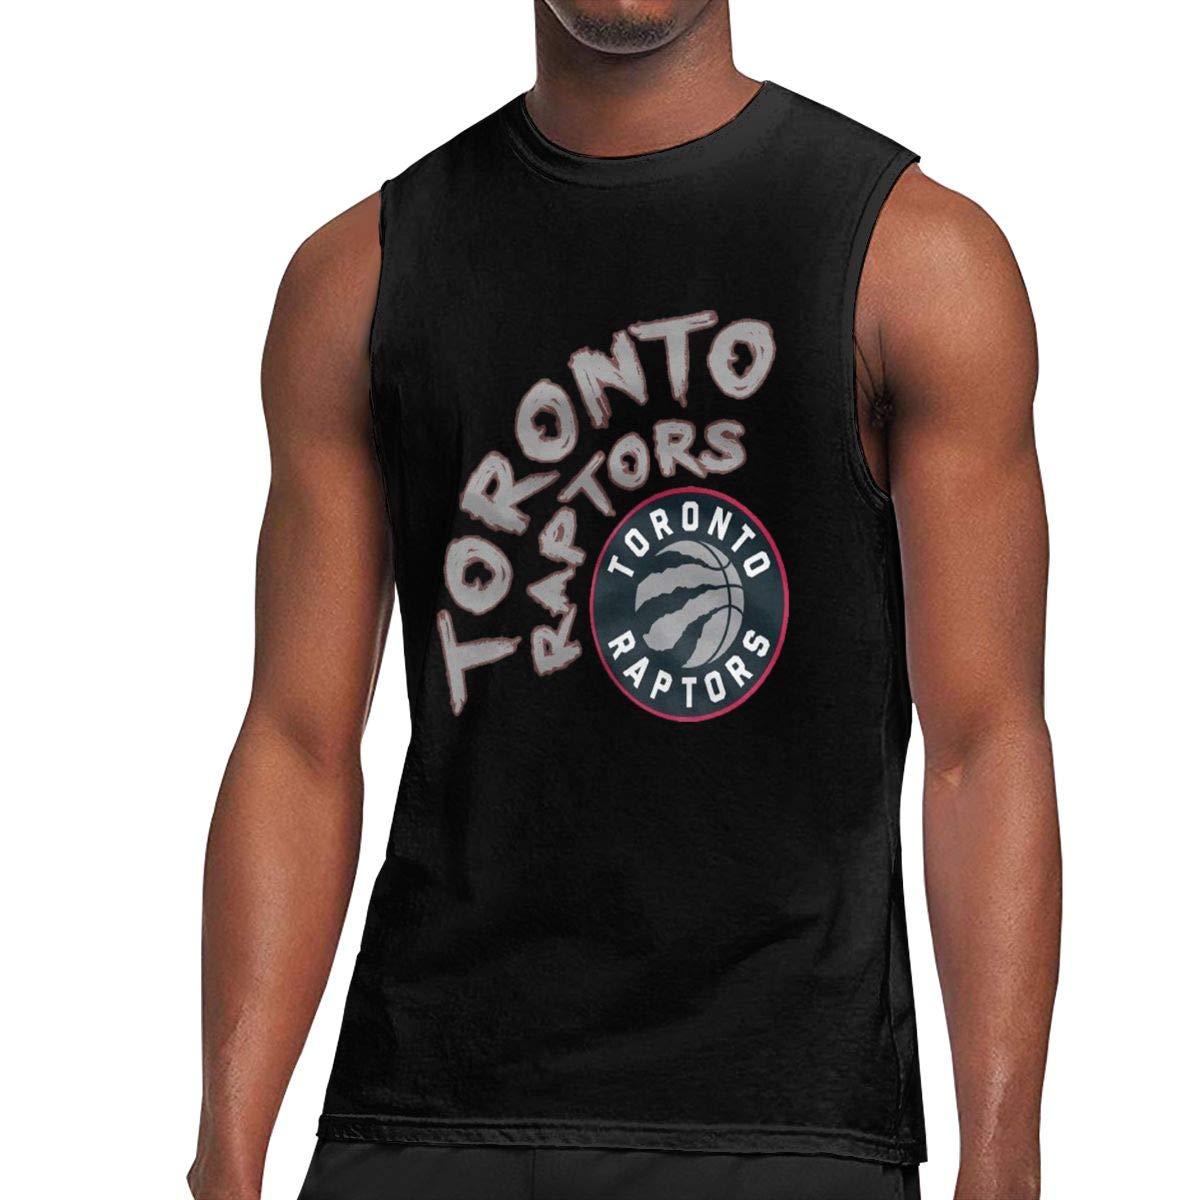 73961ea9a1b6 KaylorR Toronto-Raptors Mens Tank Tops, Sleeveless T-Shirt Vest Shirt for  Fans 2019 Champion: Amazon.ca: Clothing & Accessories